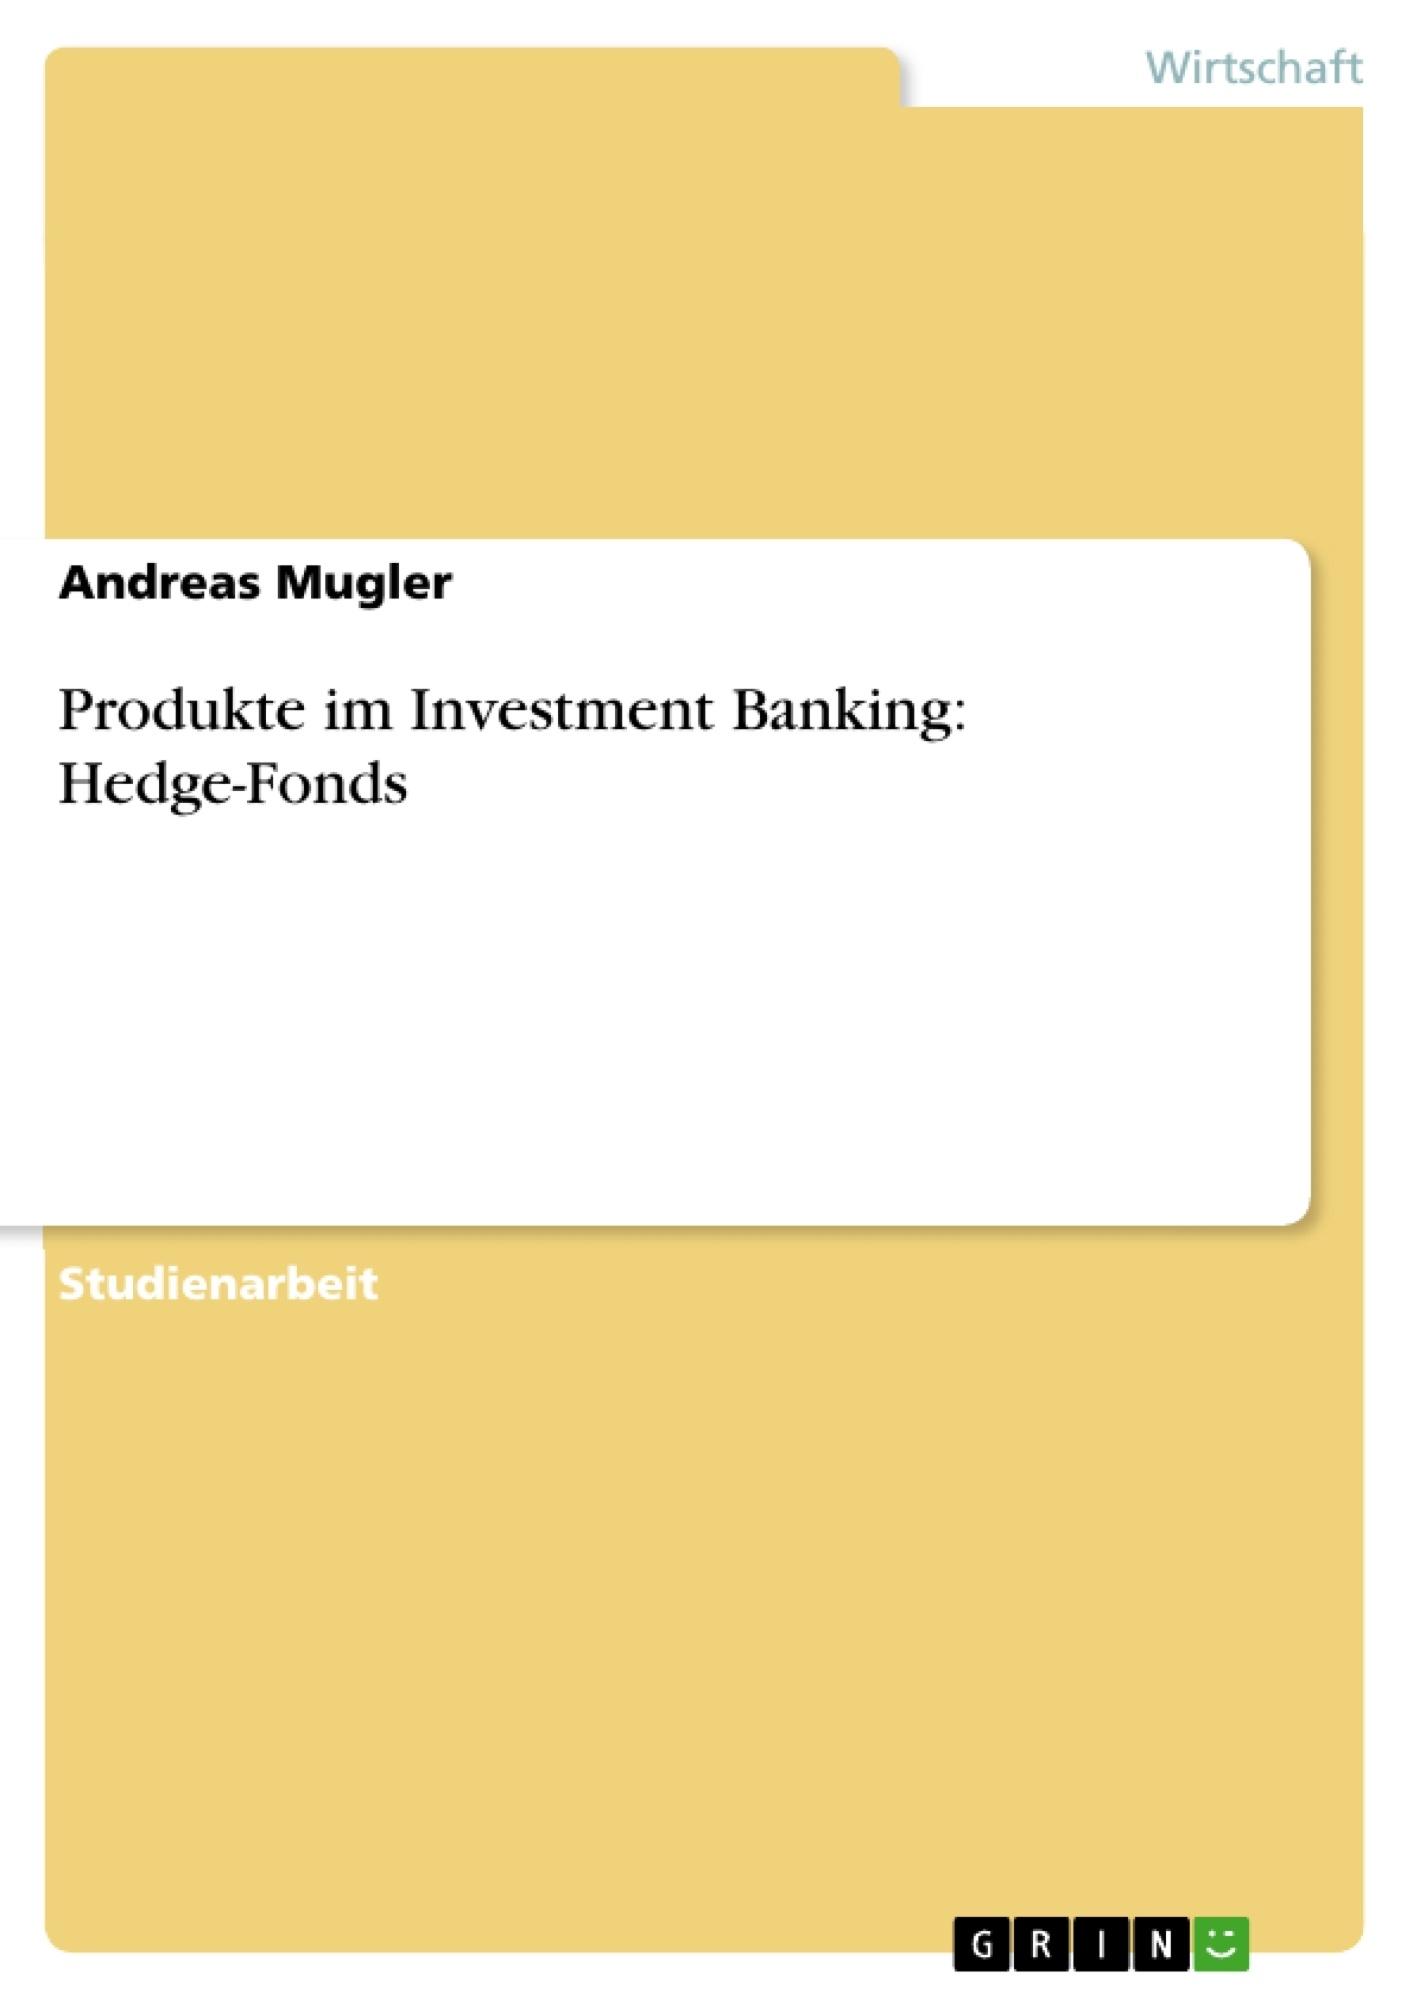 Titel: Produkte im Investment Banking: Hedge-Fonds